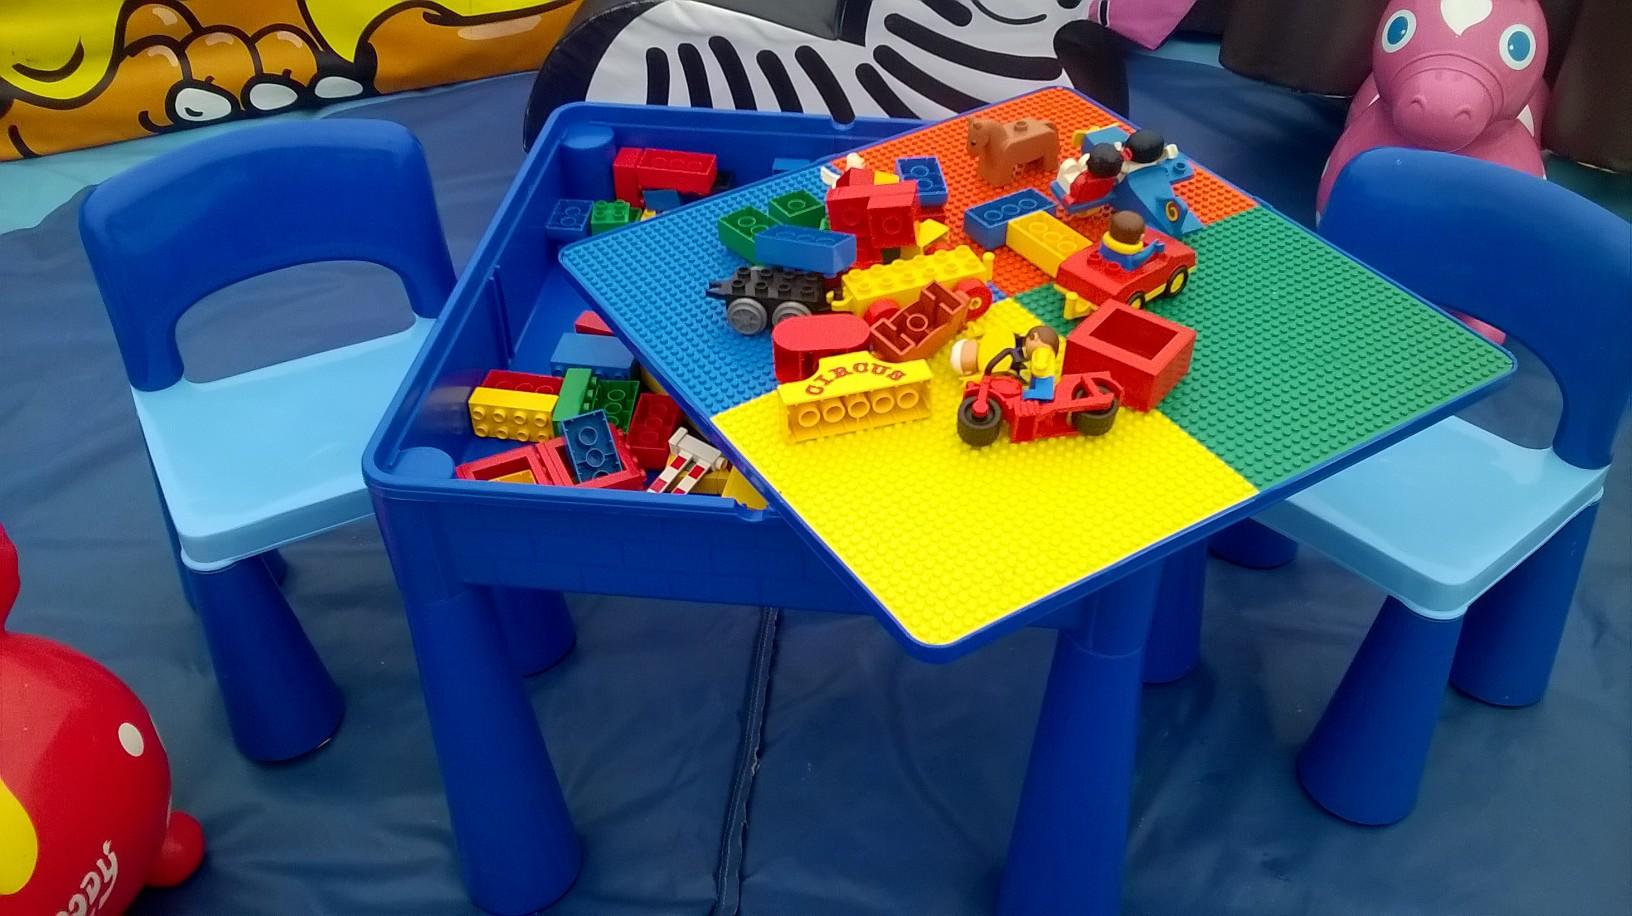 Duplo Play Table U0026 Chairs